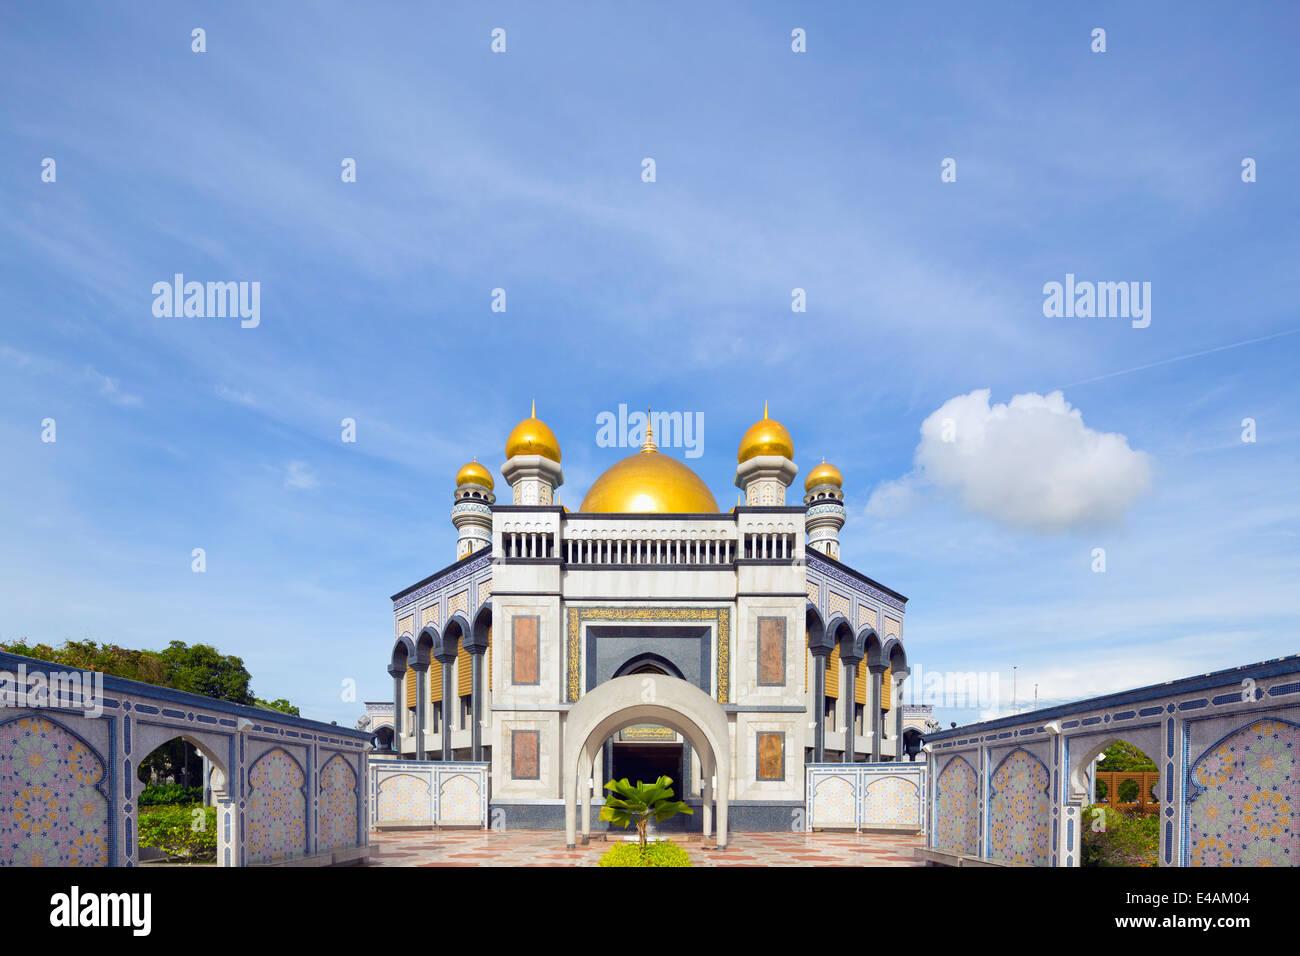 South East Asia, Kingdom of Brunei, Bandar Seri Begawan, Jame'asr Hassanal Bolkiah Mosque - Stock Image